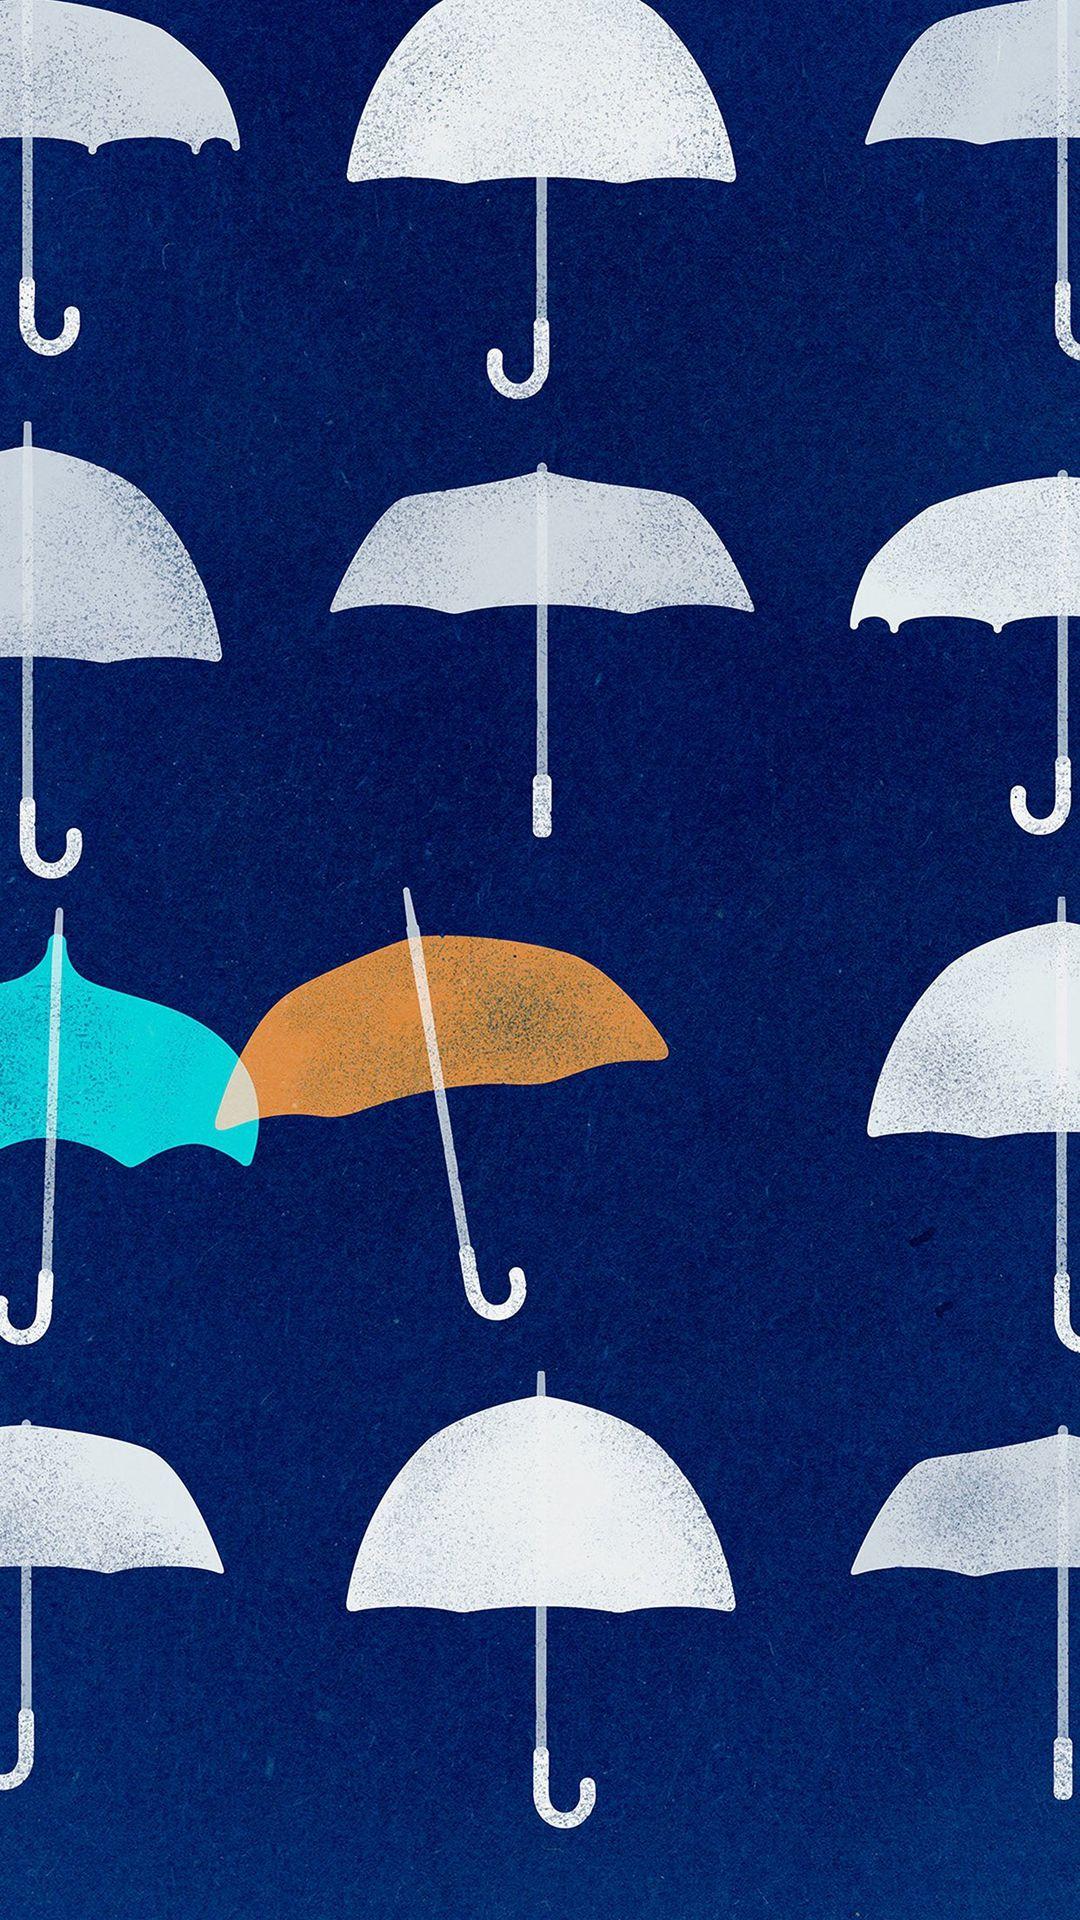 Wallpaper iphone umbrella - Blue Umbrella Cute Minimal Art Disney Iphone 6 Plus Wallpaper